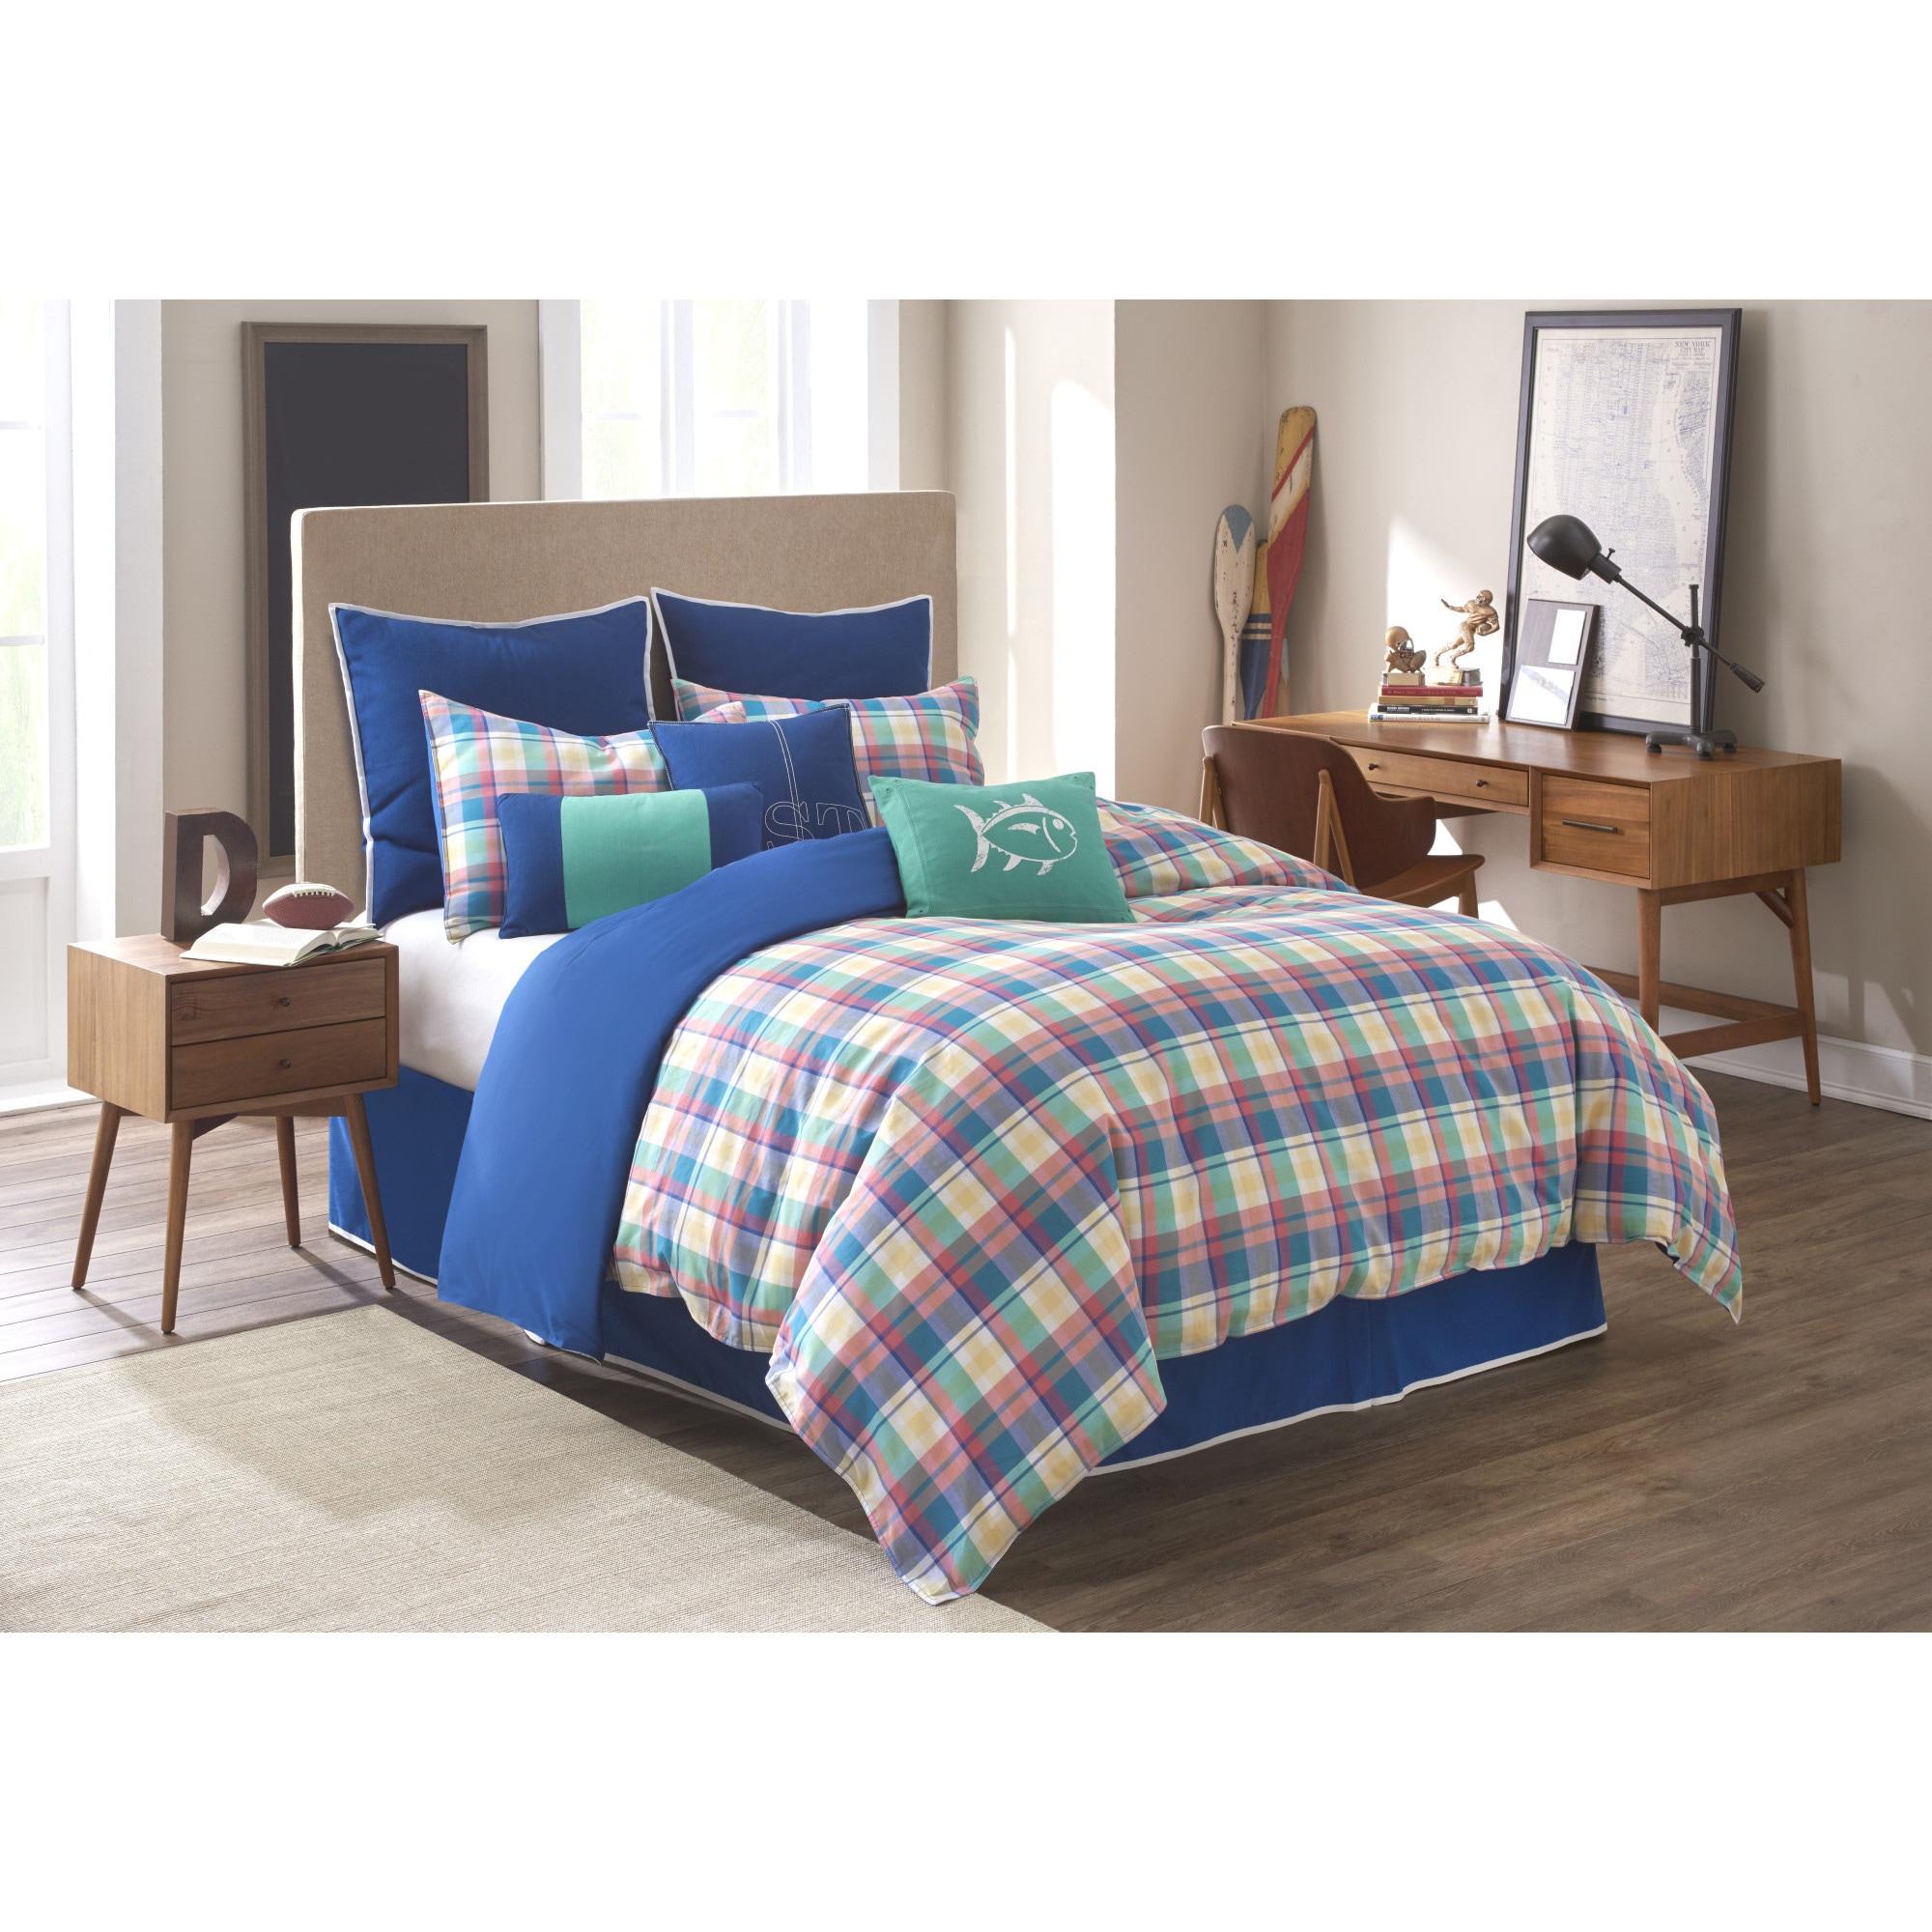 co asli tide sheets aetherair comforter southern rangers ny